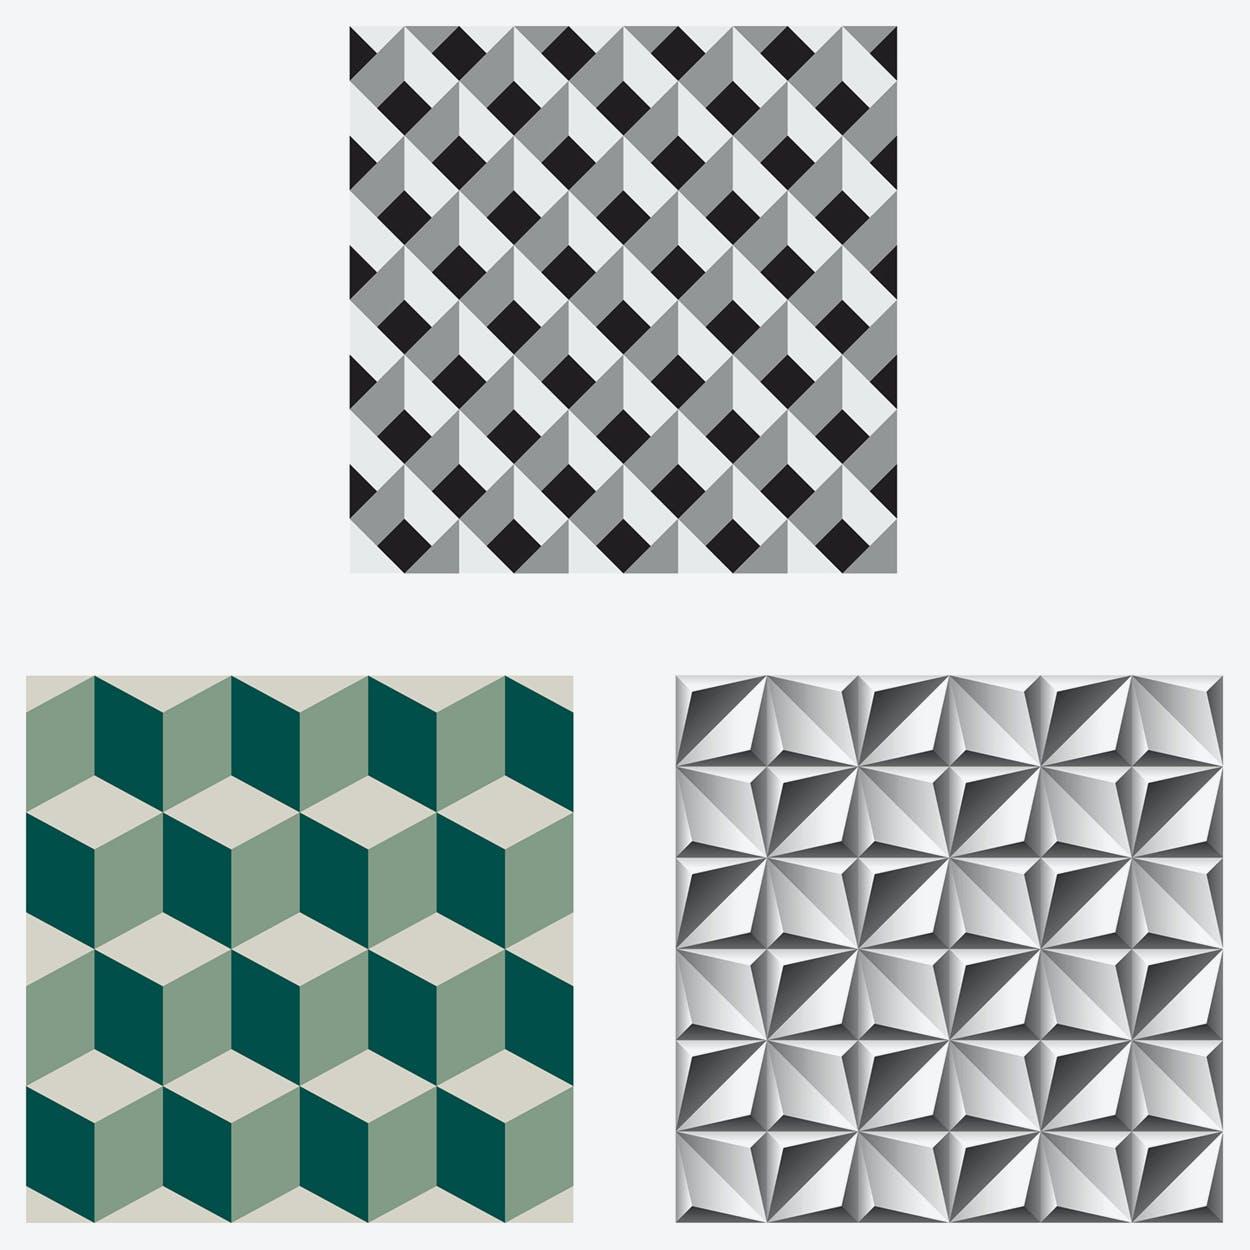 The Cubism Self-Adhesive Furniture Wrap